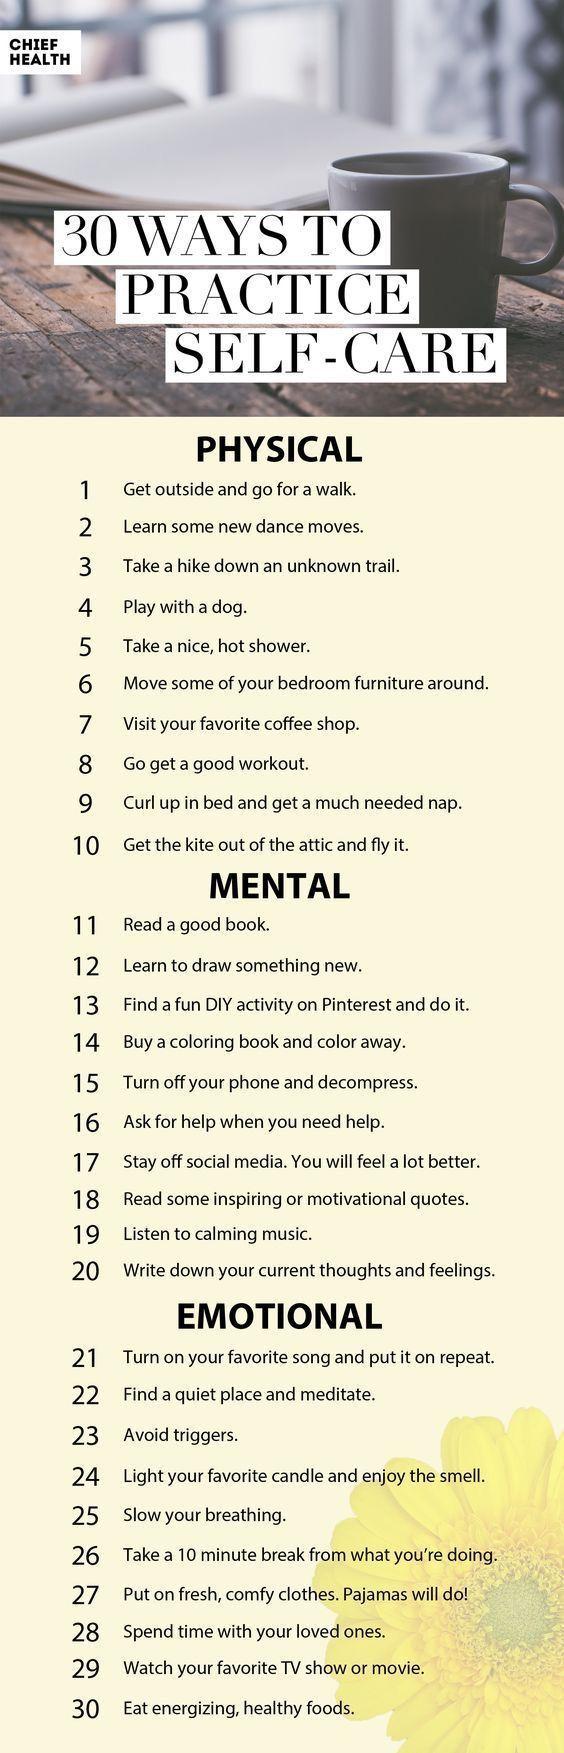 #motivation #motivational #inspire #inspirational #youarethestorm #storm #list #self #care #quote #quotes #sayings #motivate